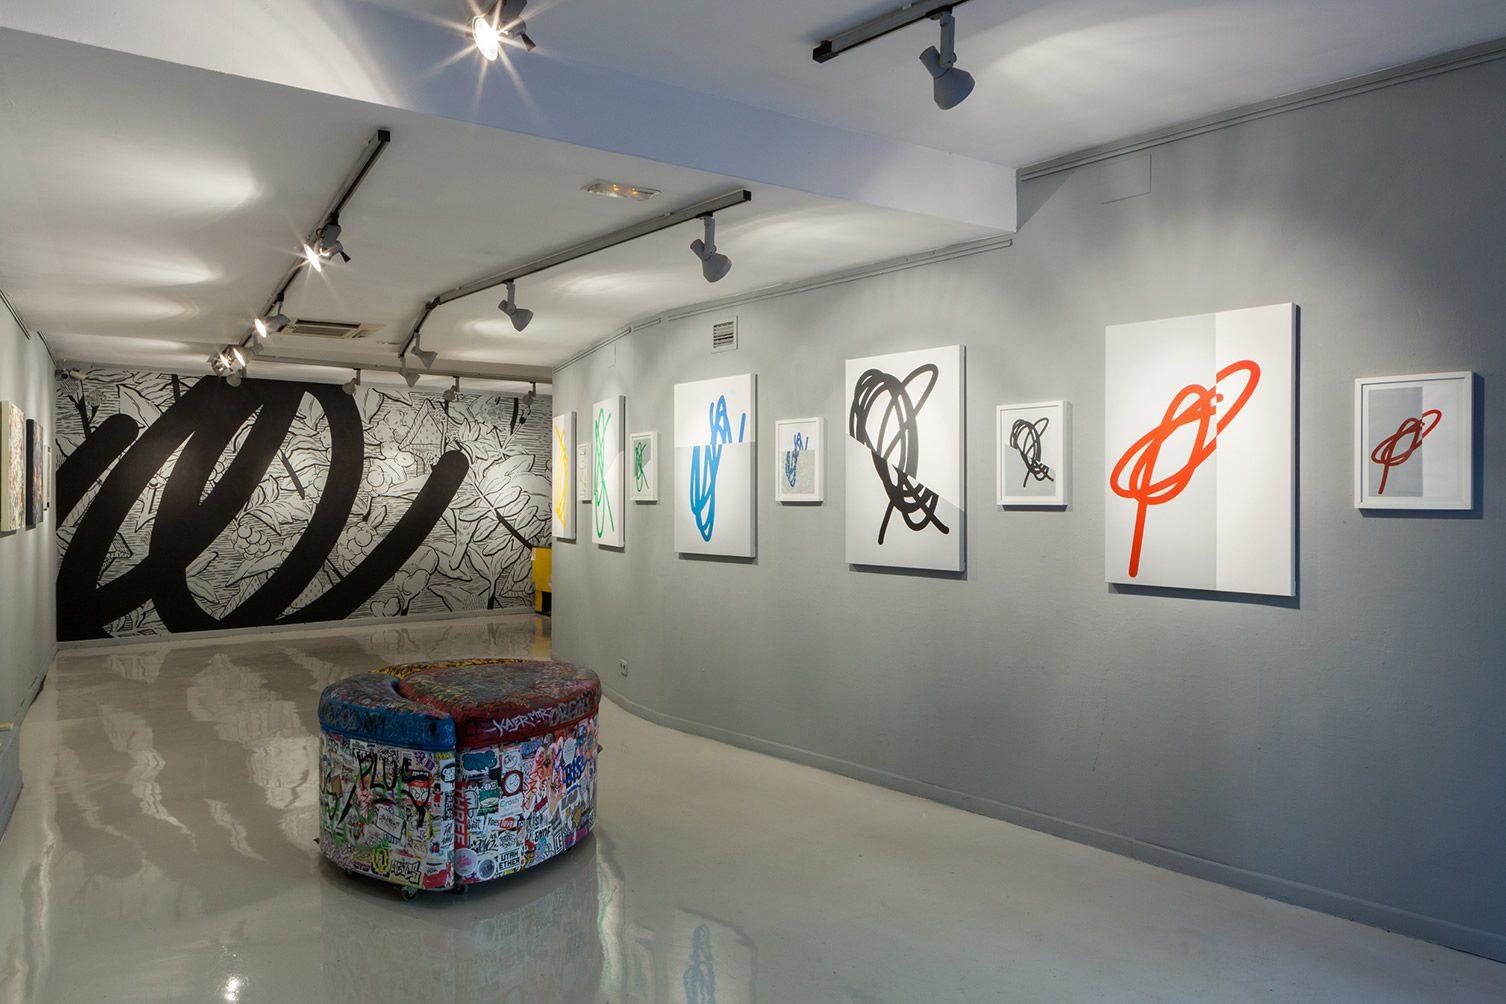 Pastel Interieur Barcelona : Een pastel interieur in barcelona thestylebox